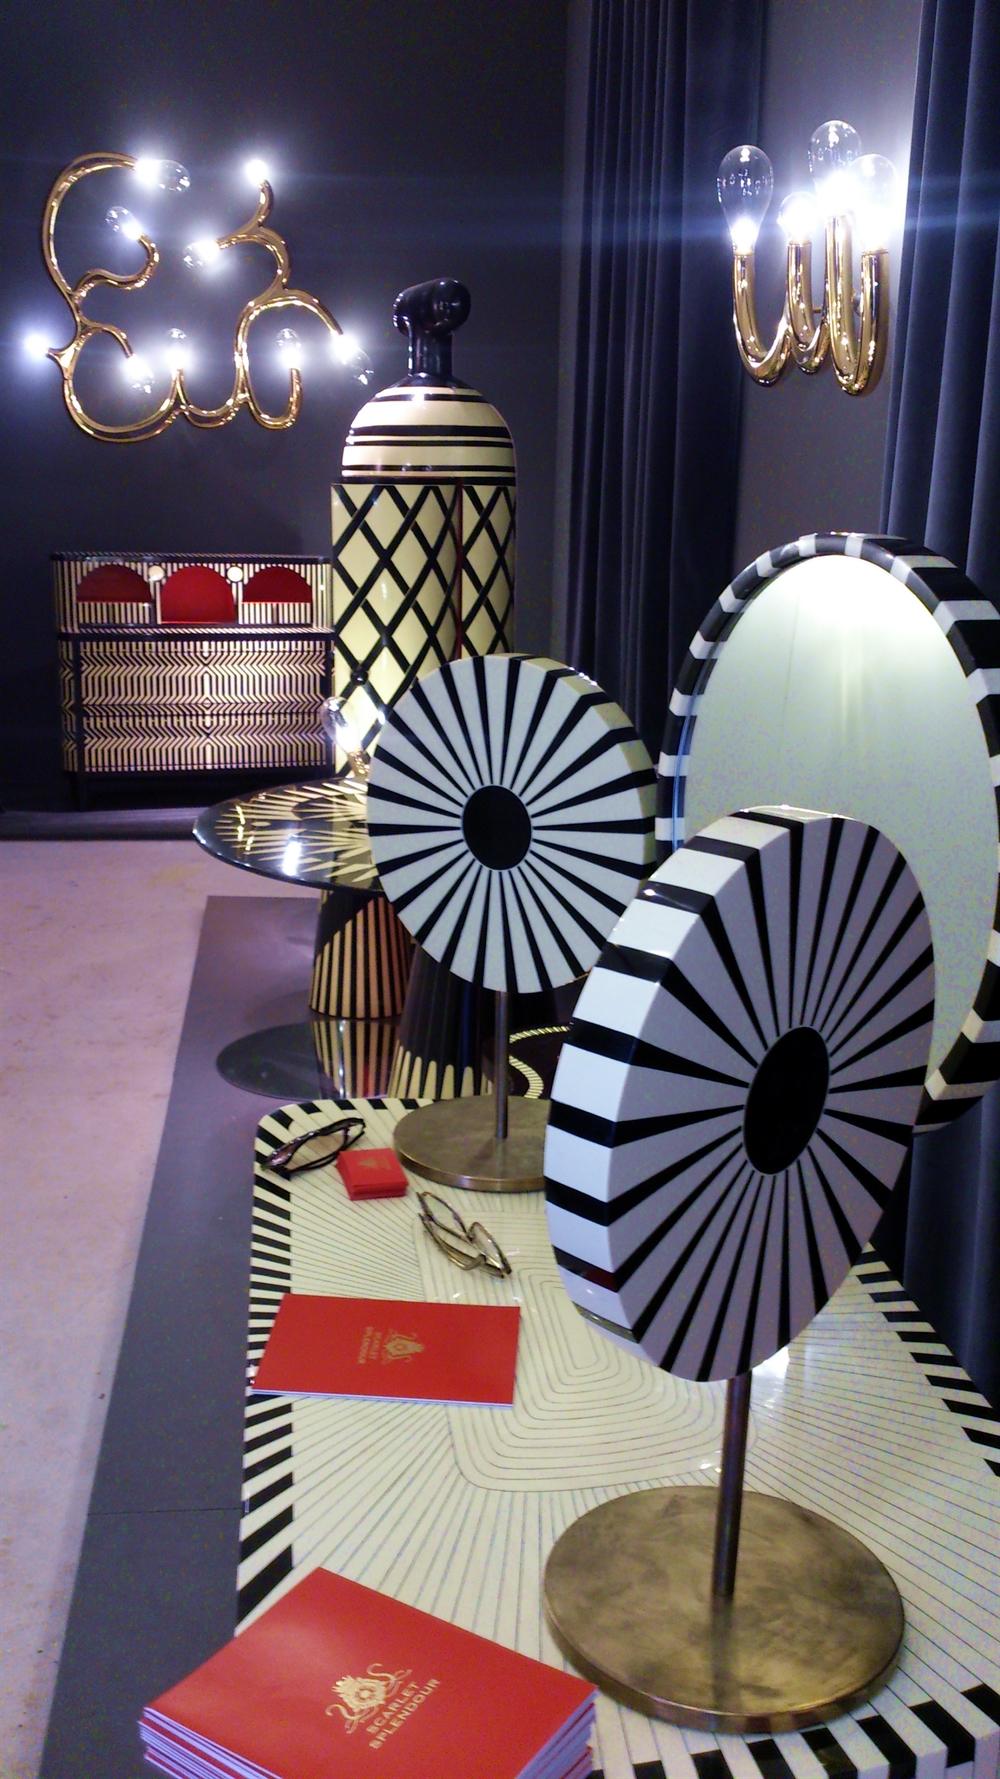 21 fuorisalone milan design week 2015 rossana orlandi nika zupanc gufram marimekko scarlet splendour interior design luxurious furniture meble luksusowe projektowanie marcel wanders